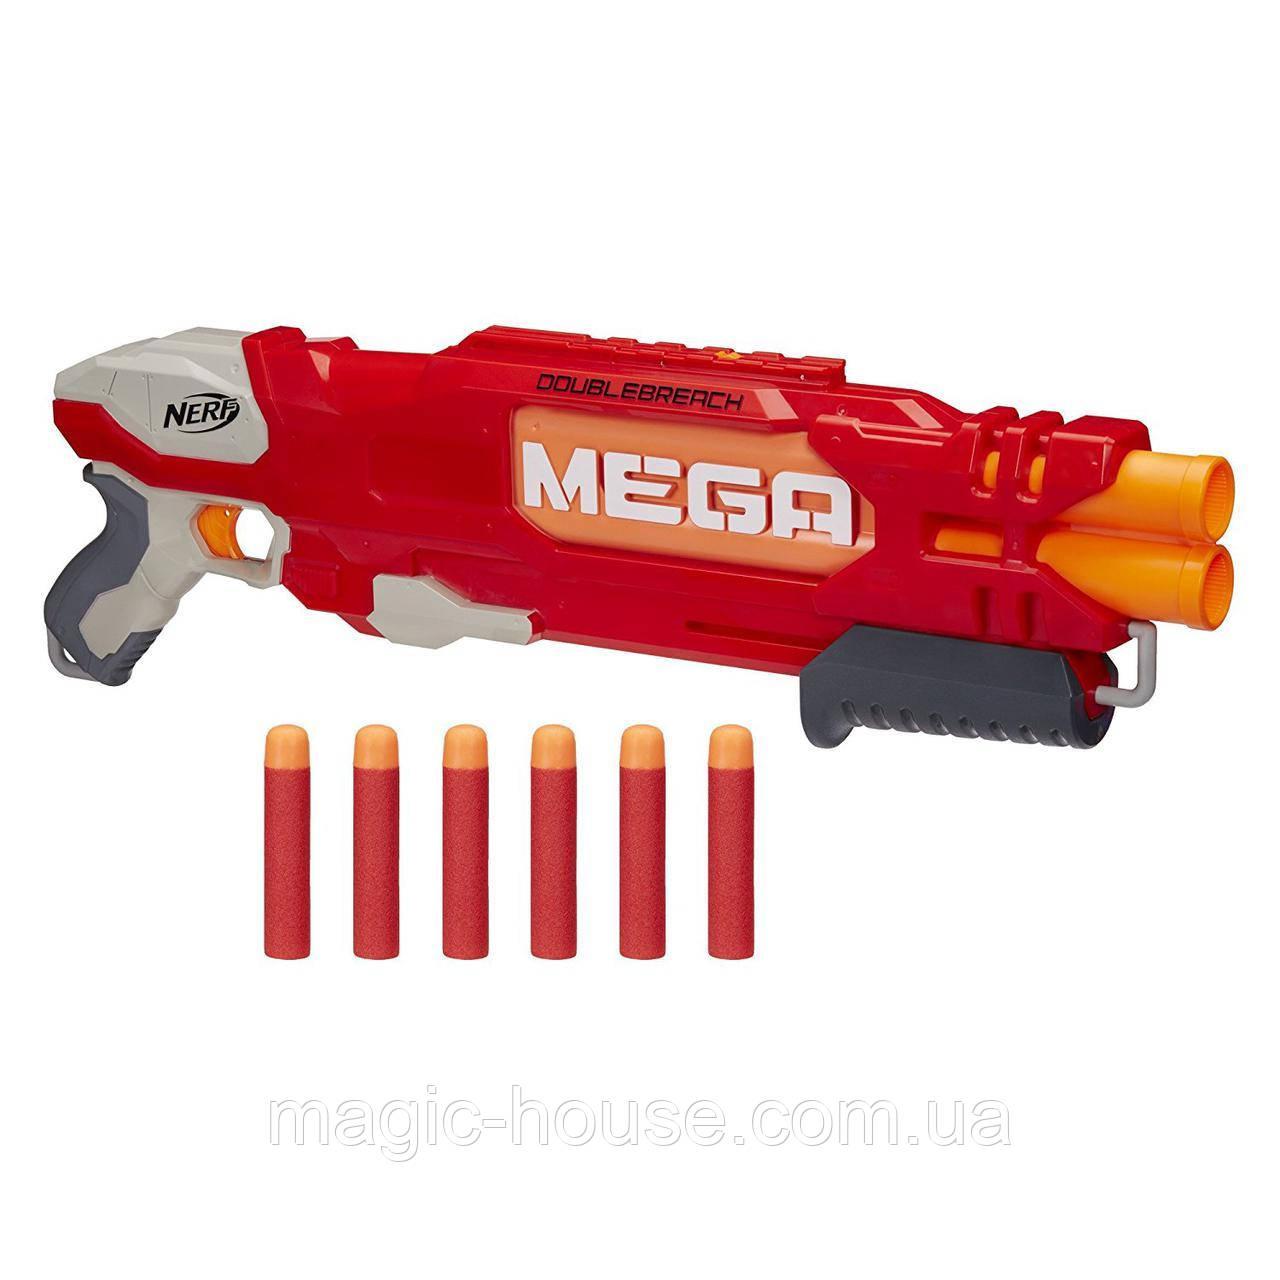 Бластер Nerf Мега ДаблБрич DoubleBreach Blaster